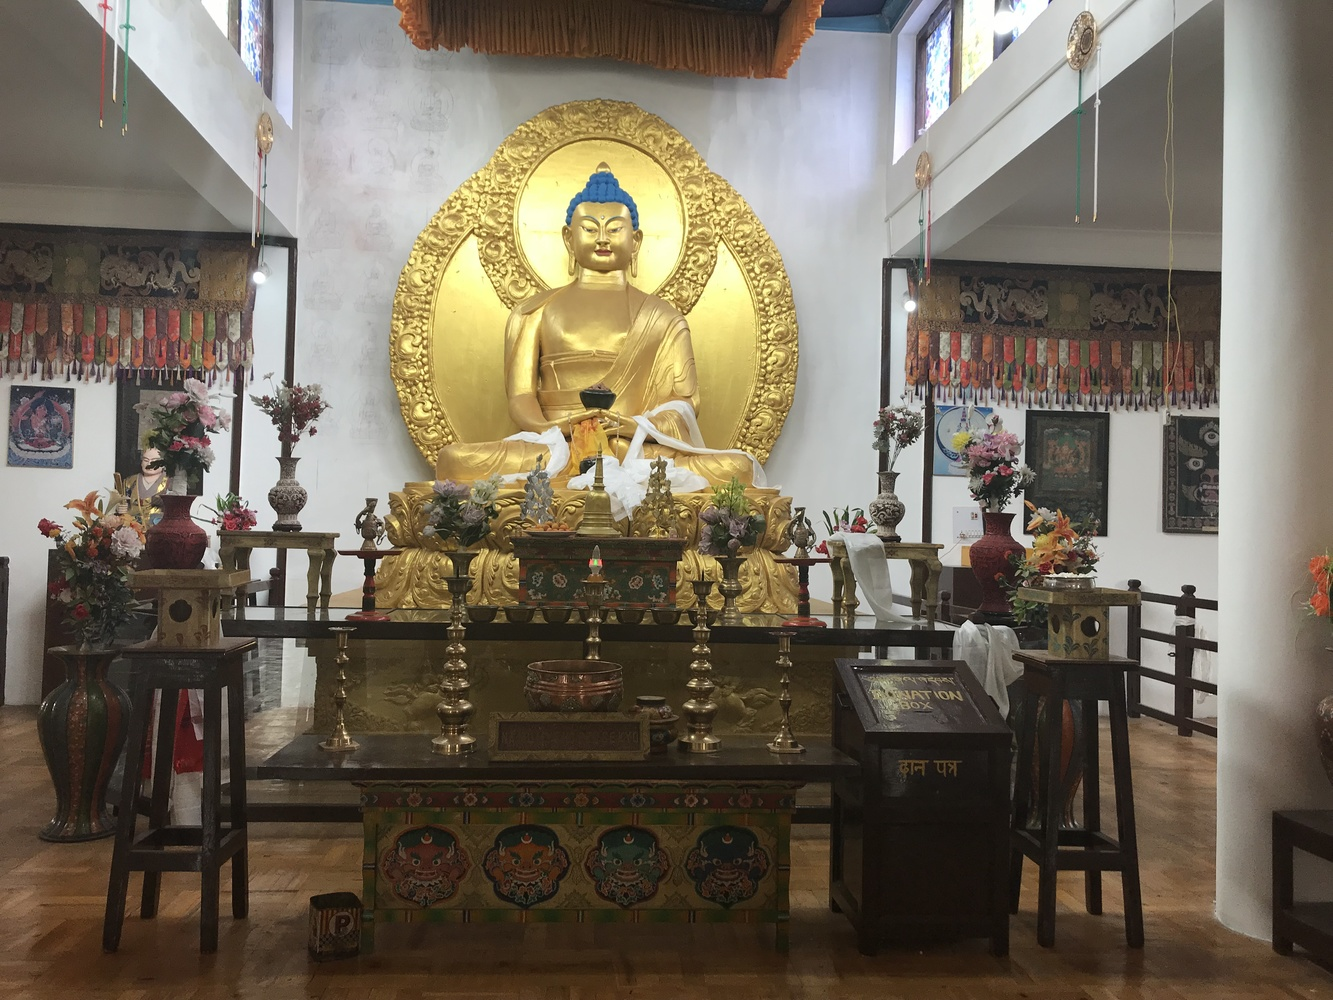 Lord Buddha Temple by Nancy Perez